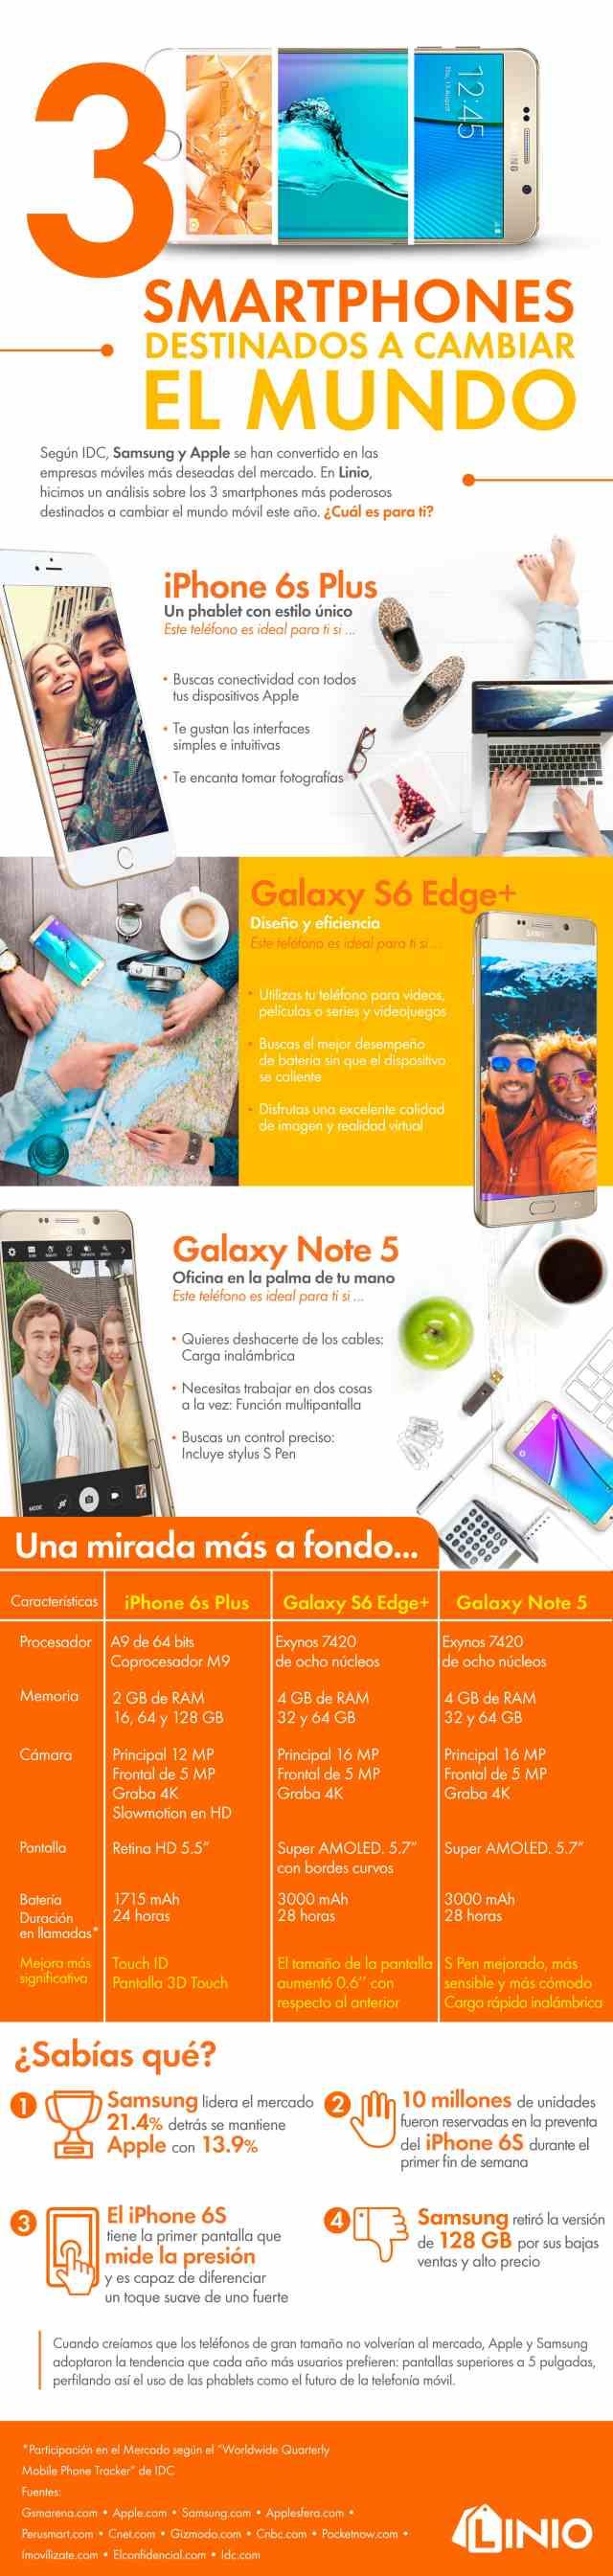 Infografia-smartphones_alta